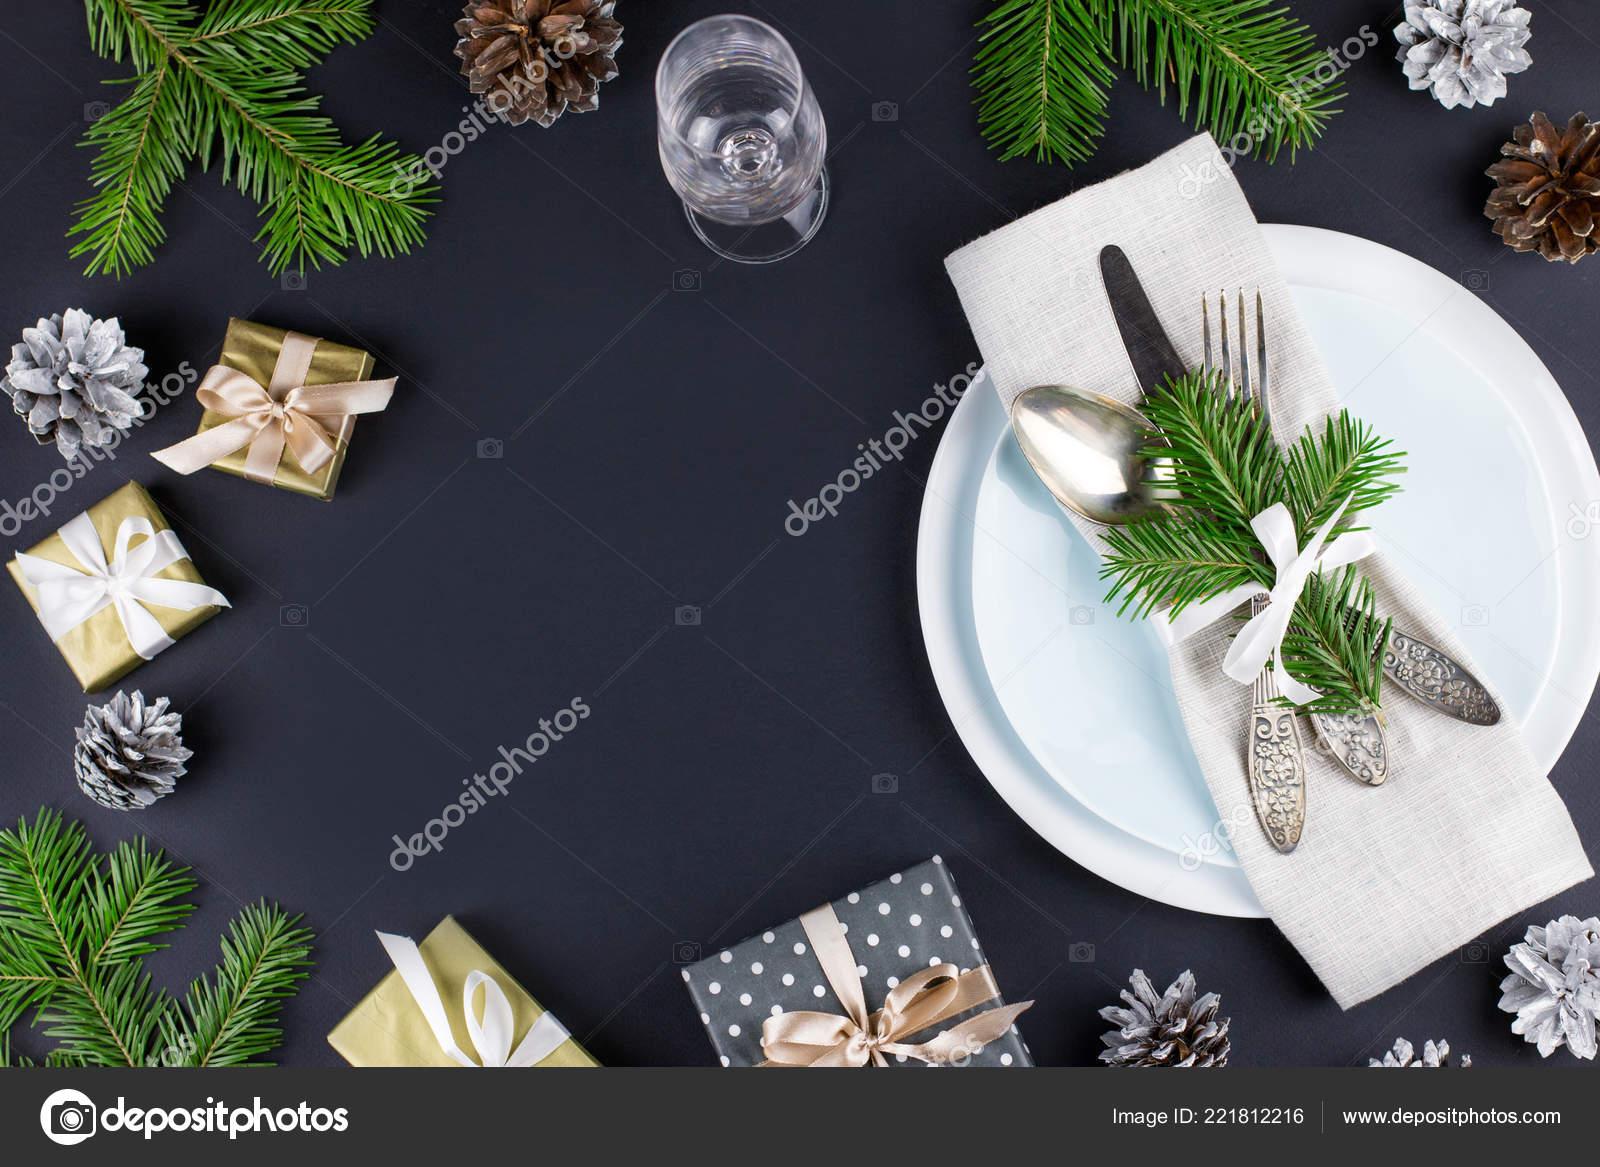 Christmas Table Setting Plates Silverware Gift Box Decorations Black Gold — Stock Photo